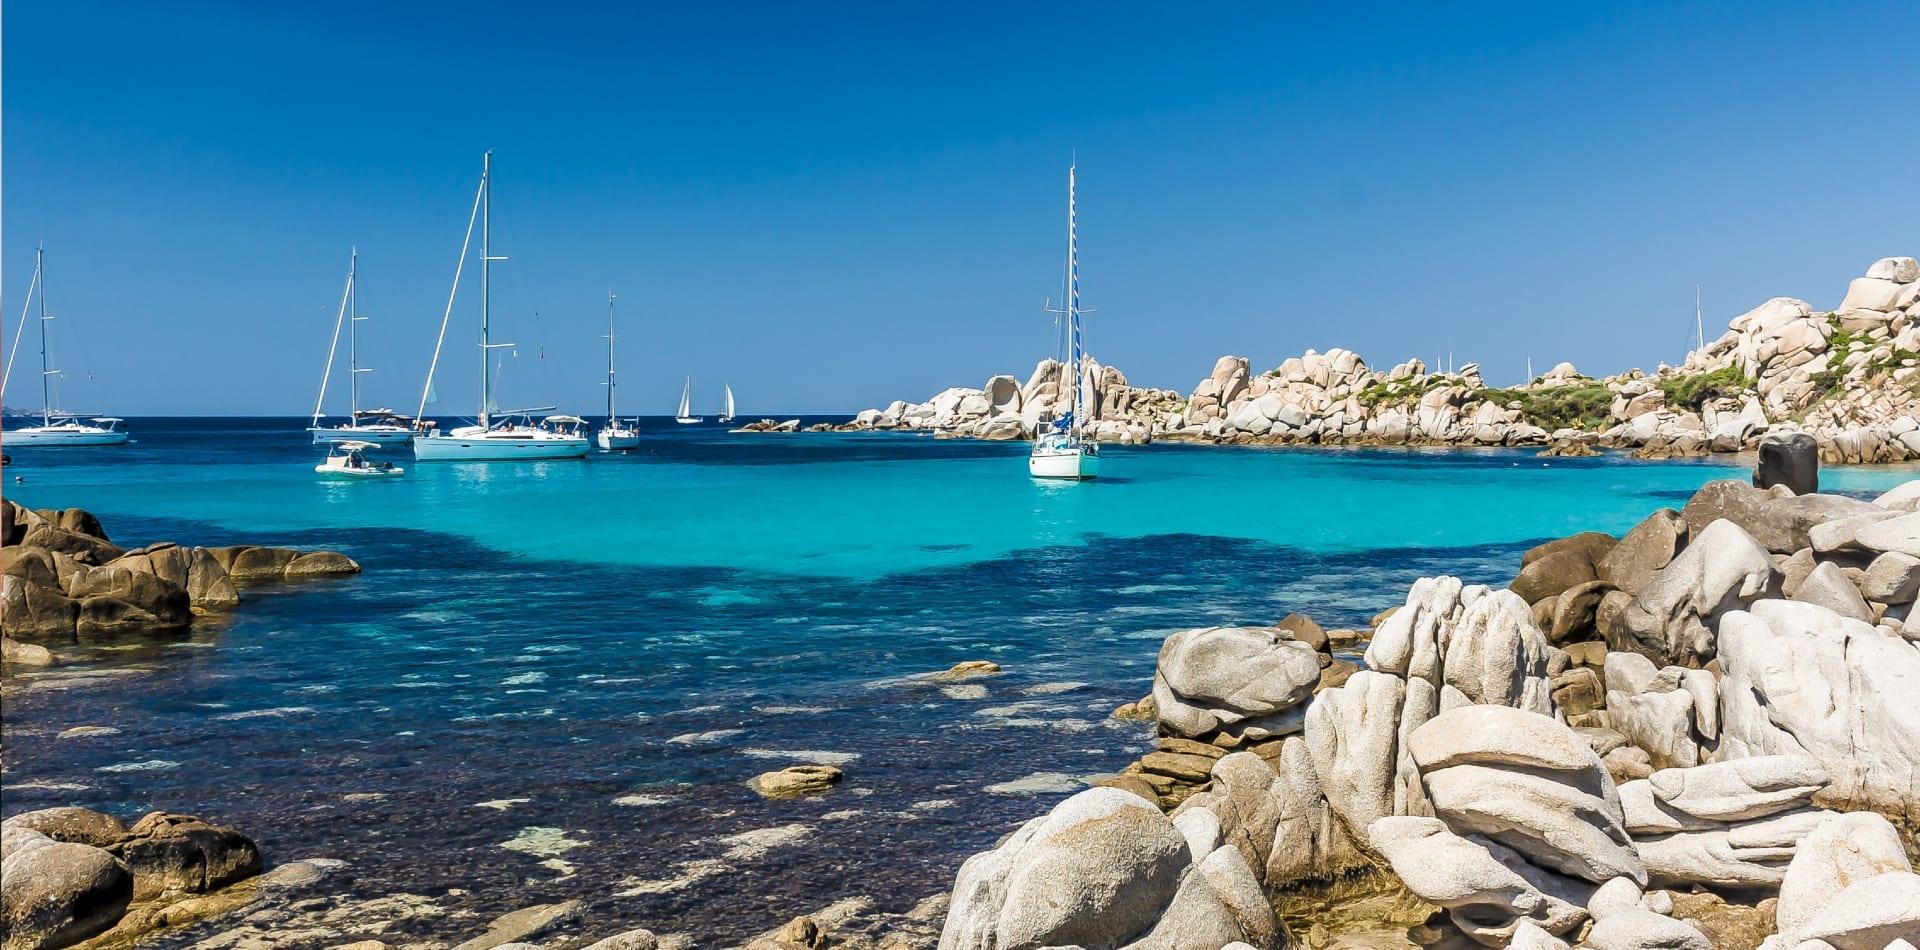 Corsica coastline in southern France